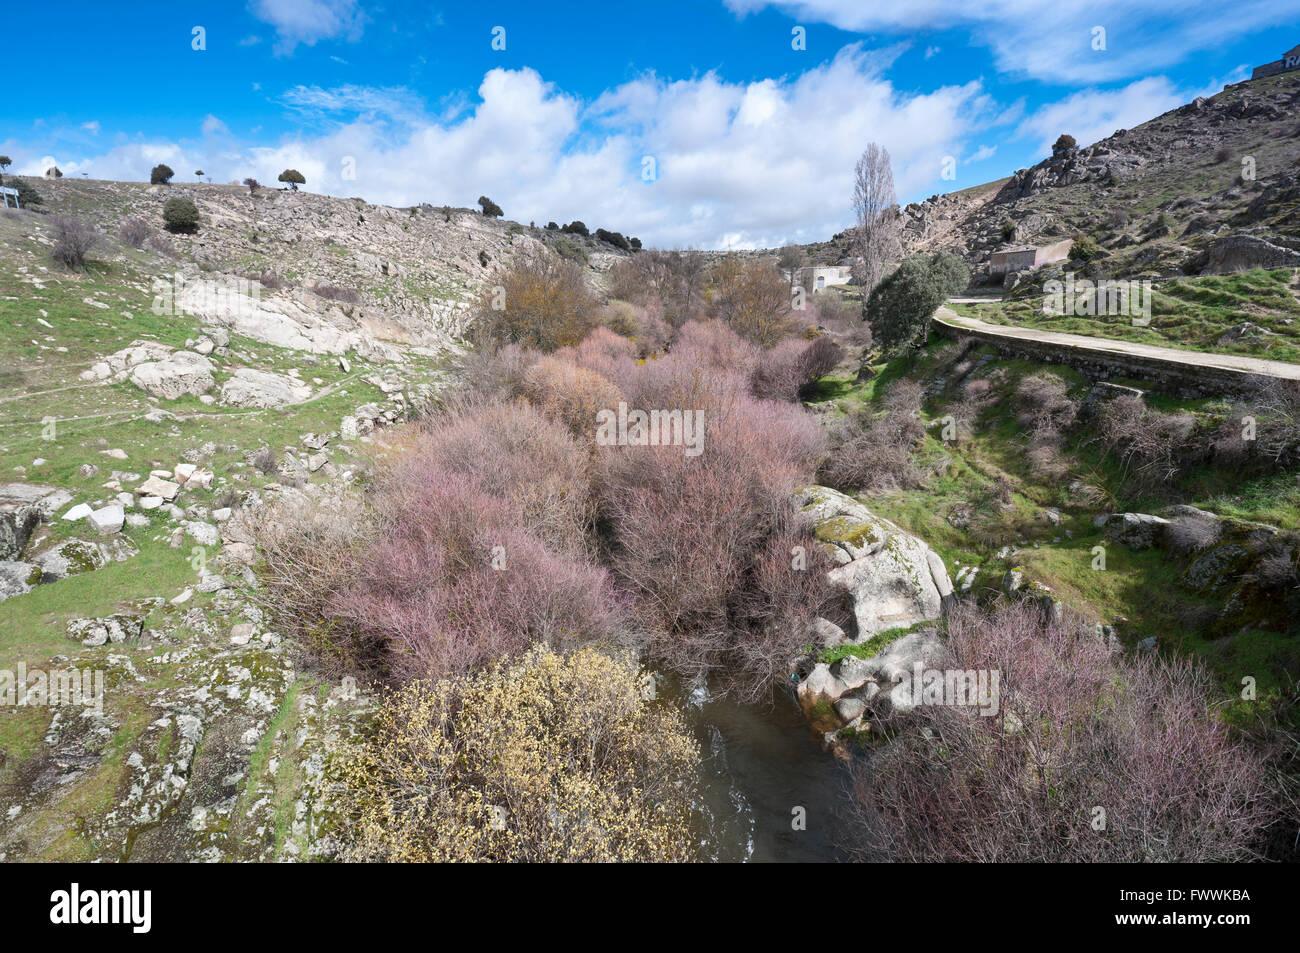 Riparian forest along the river Manzanares, Colmenar Viejo, Madrid, Spain Stock Photo